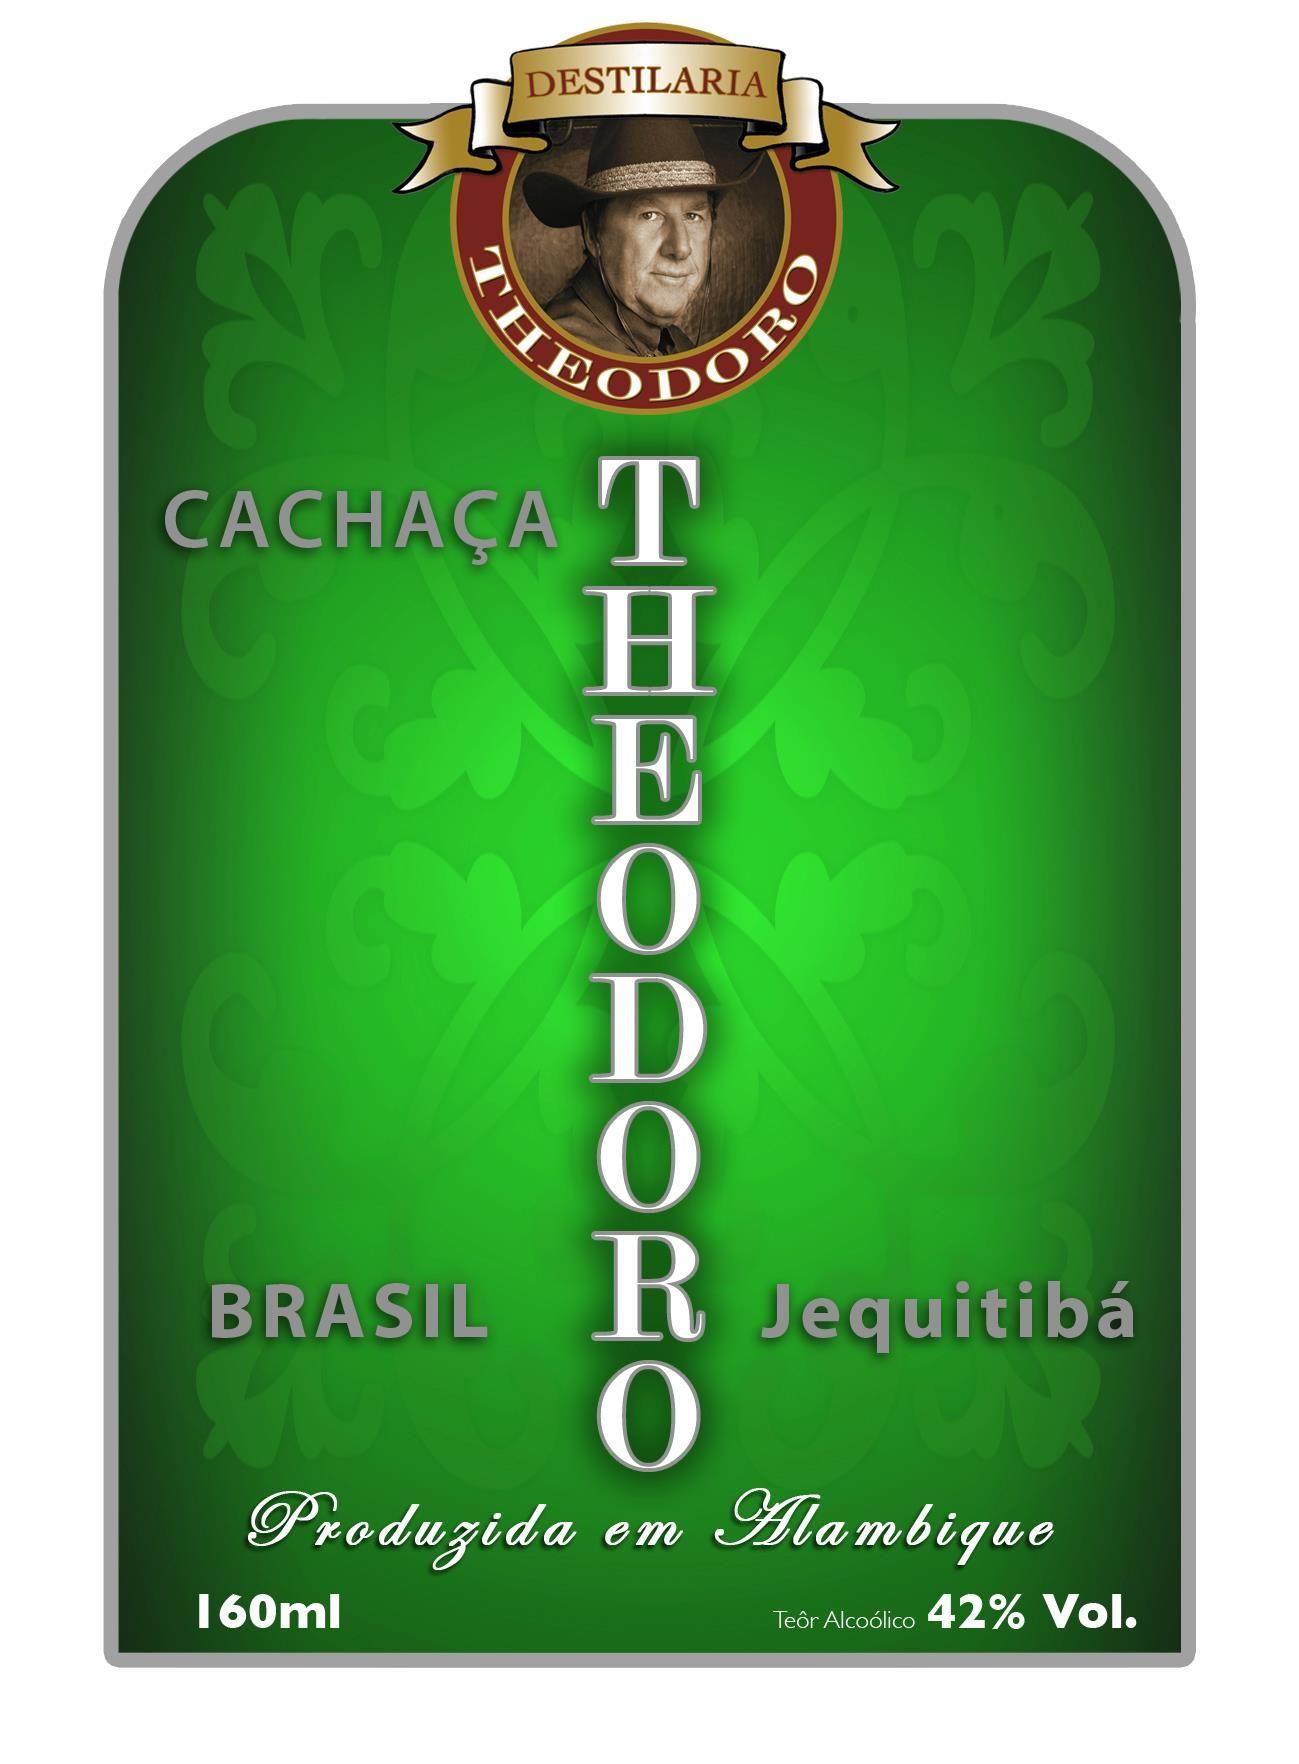 Destilaria Theodoro Alambique De Cobre Producao De Cachaca E